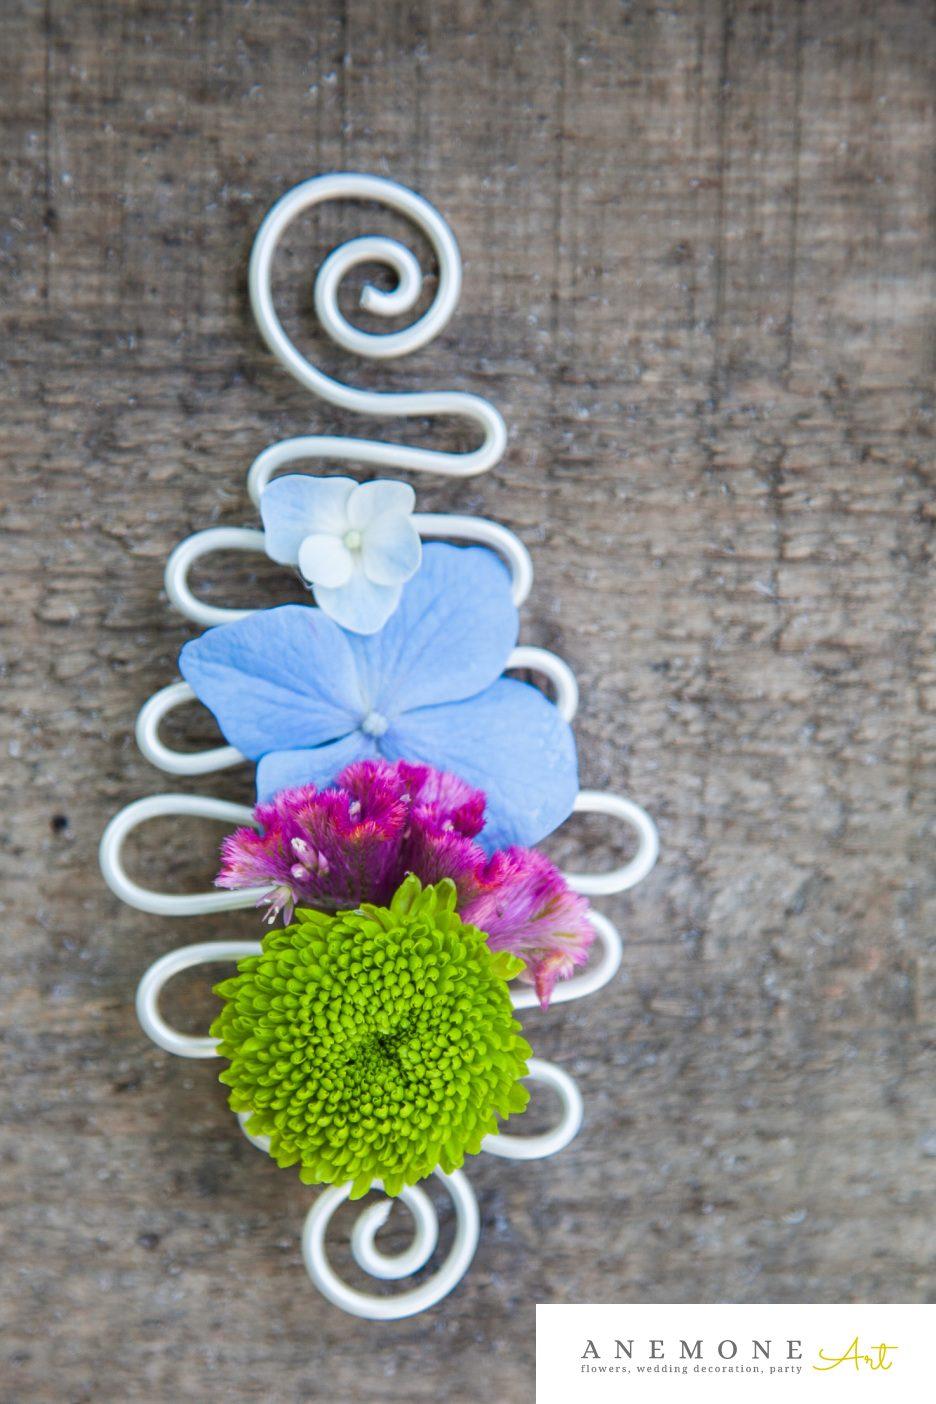 Poza, foto cu Flori de nunta cocarda, multicolor in Arad, Timisoara, Oradea (wedding flowers, bouquets) nunta Arad, Timisoara, Oradea